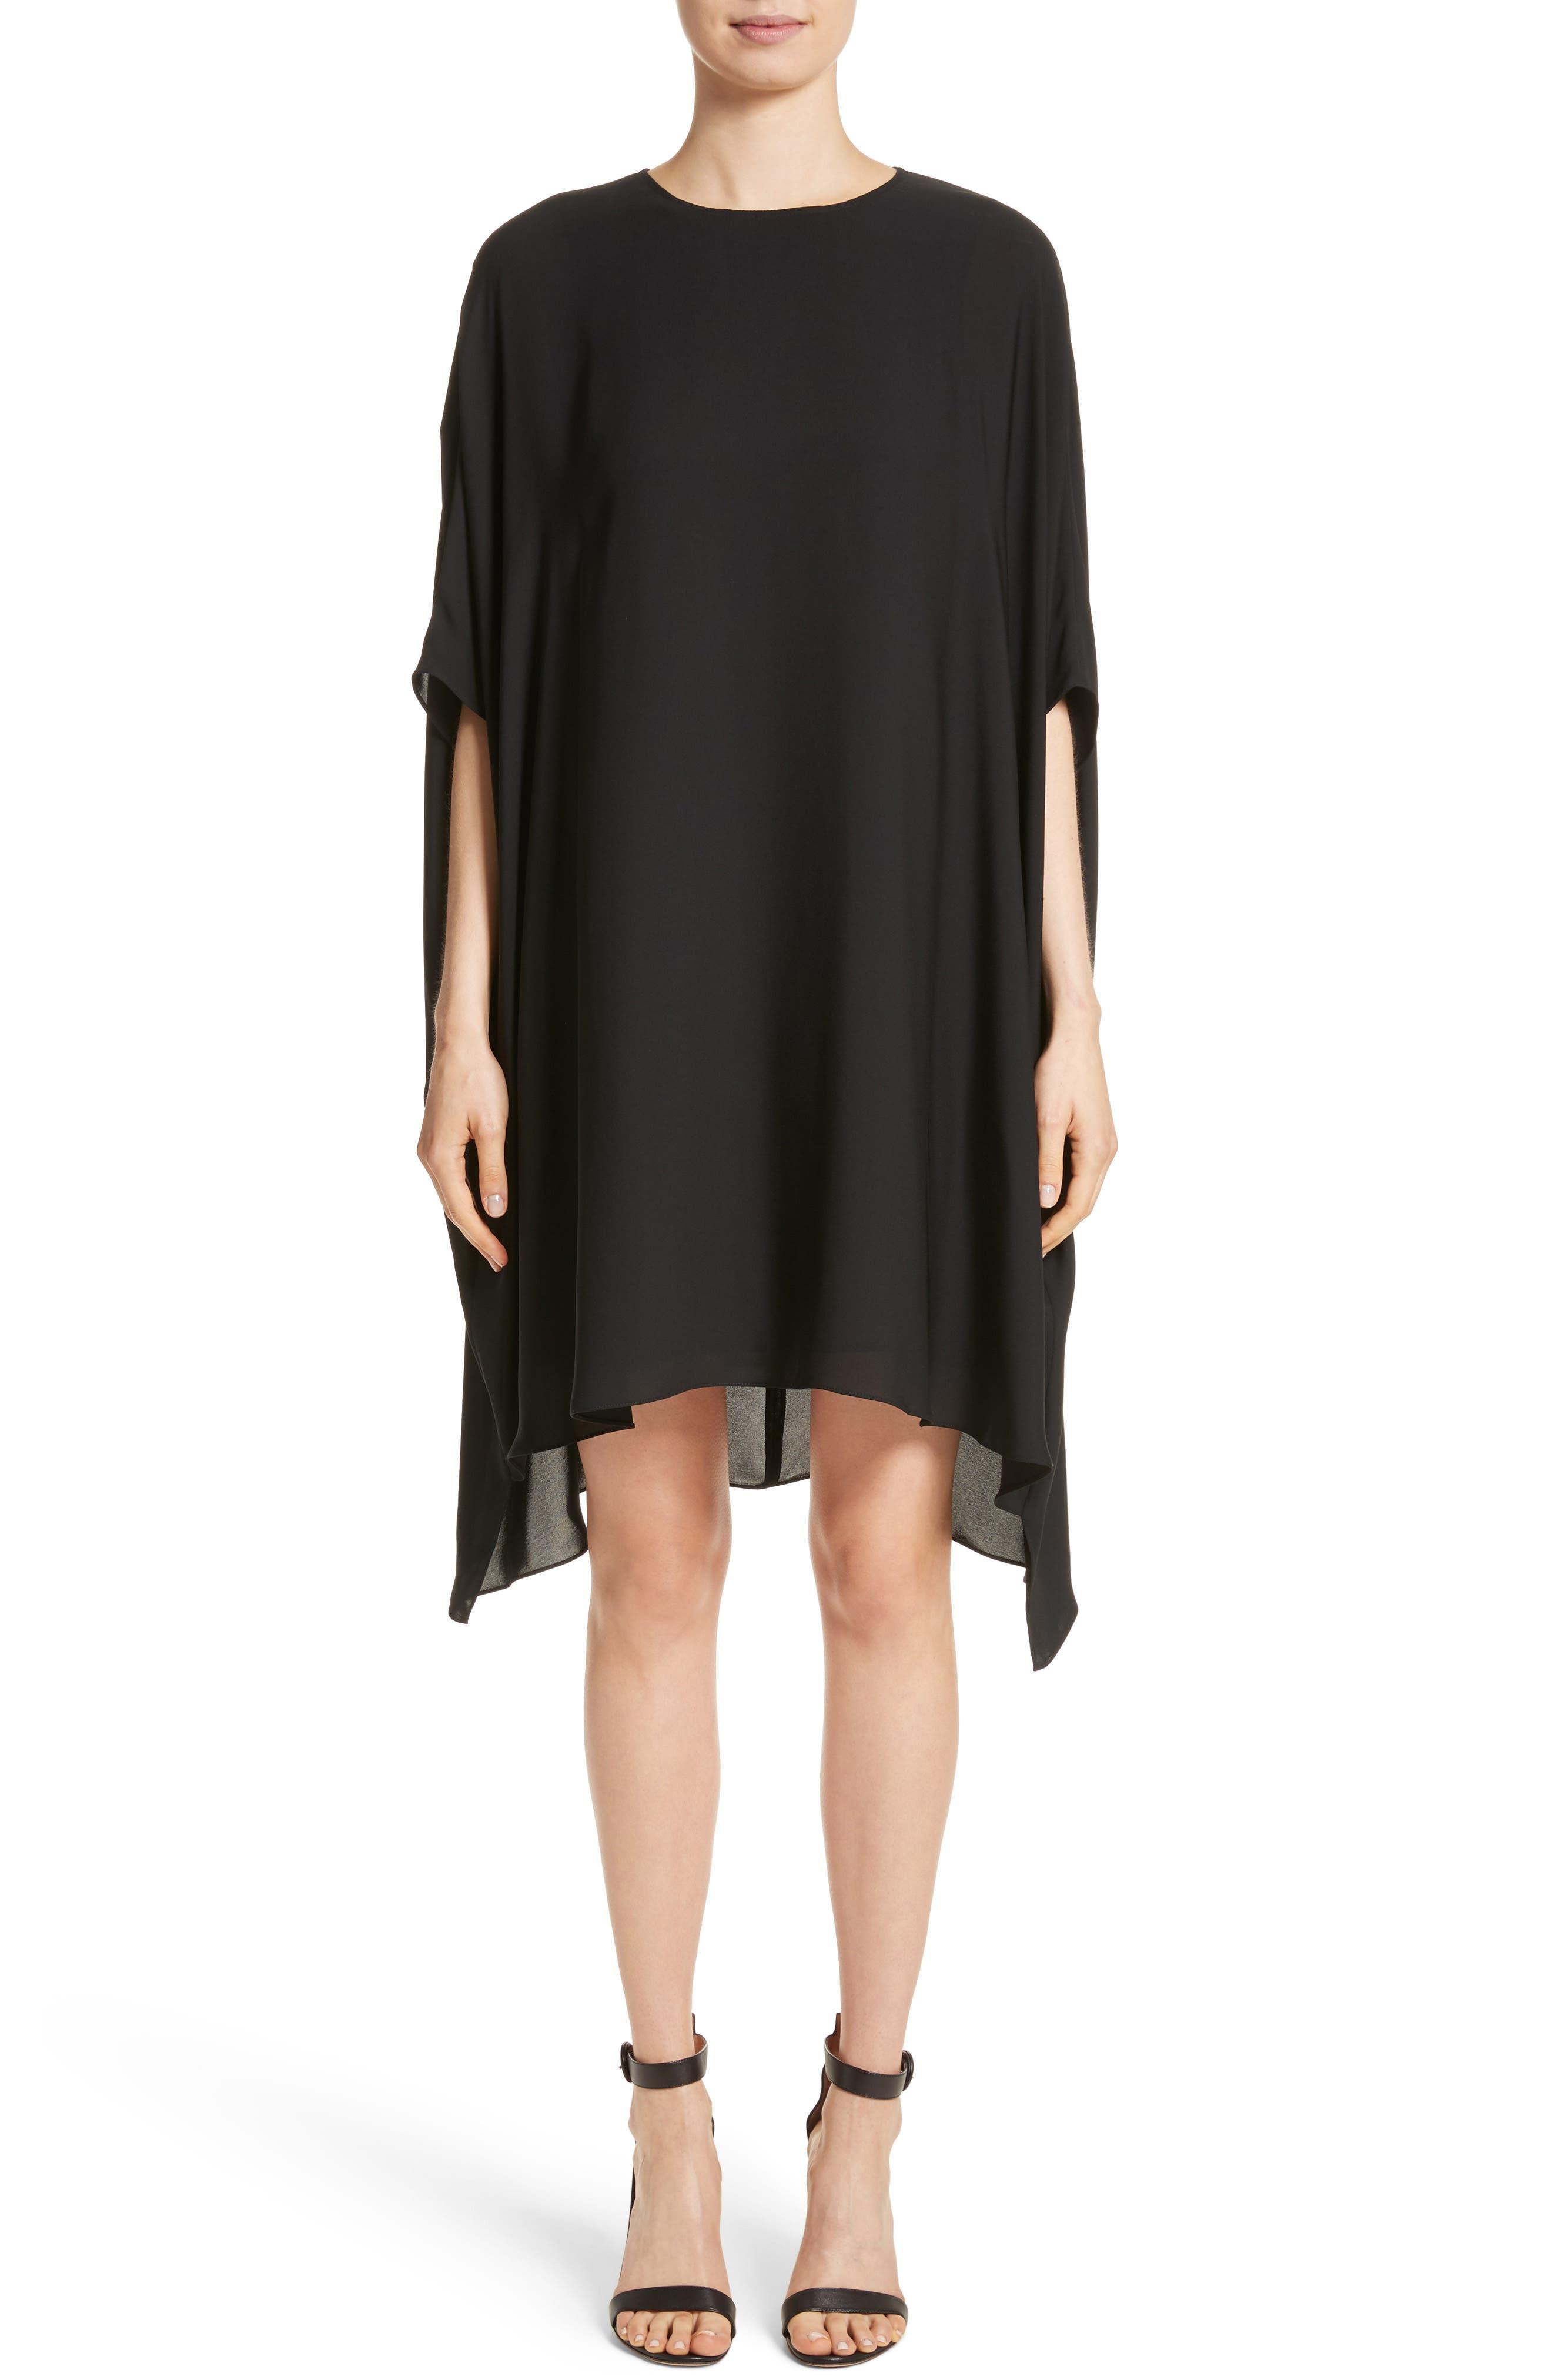 ST. JOHN COLLECTION, Double Silk Georgette Draped Dress, Main thumbnail 1, color, CAVIAR